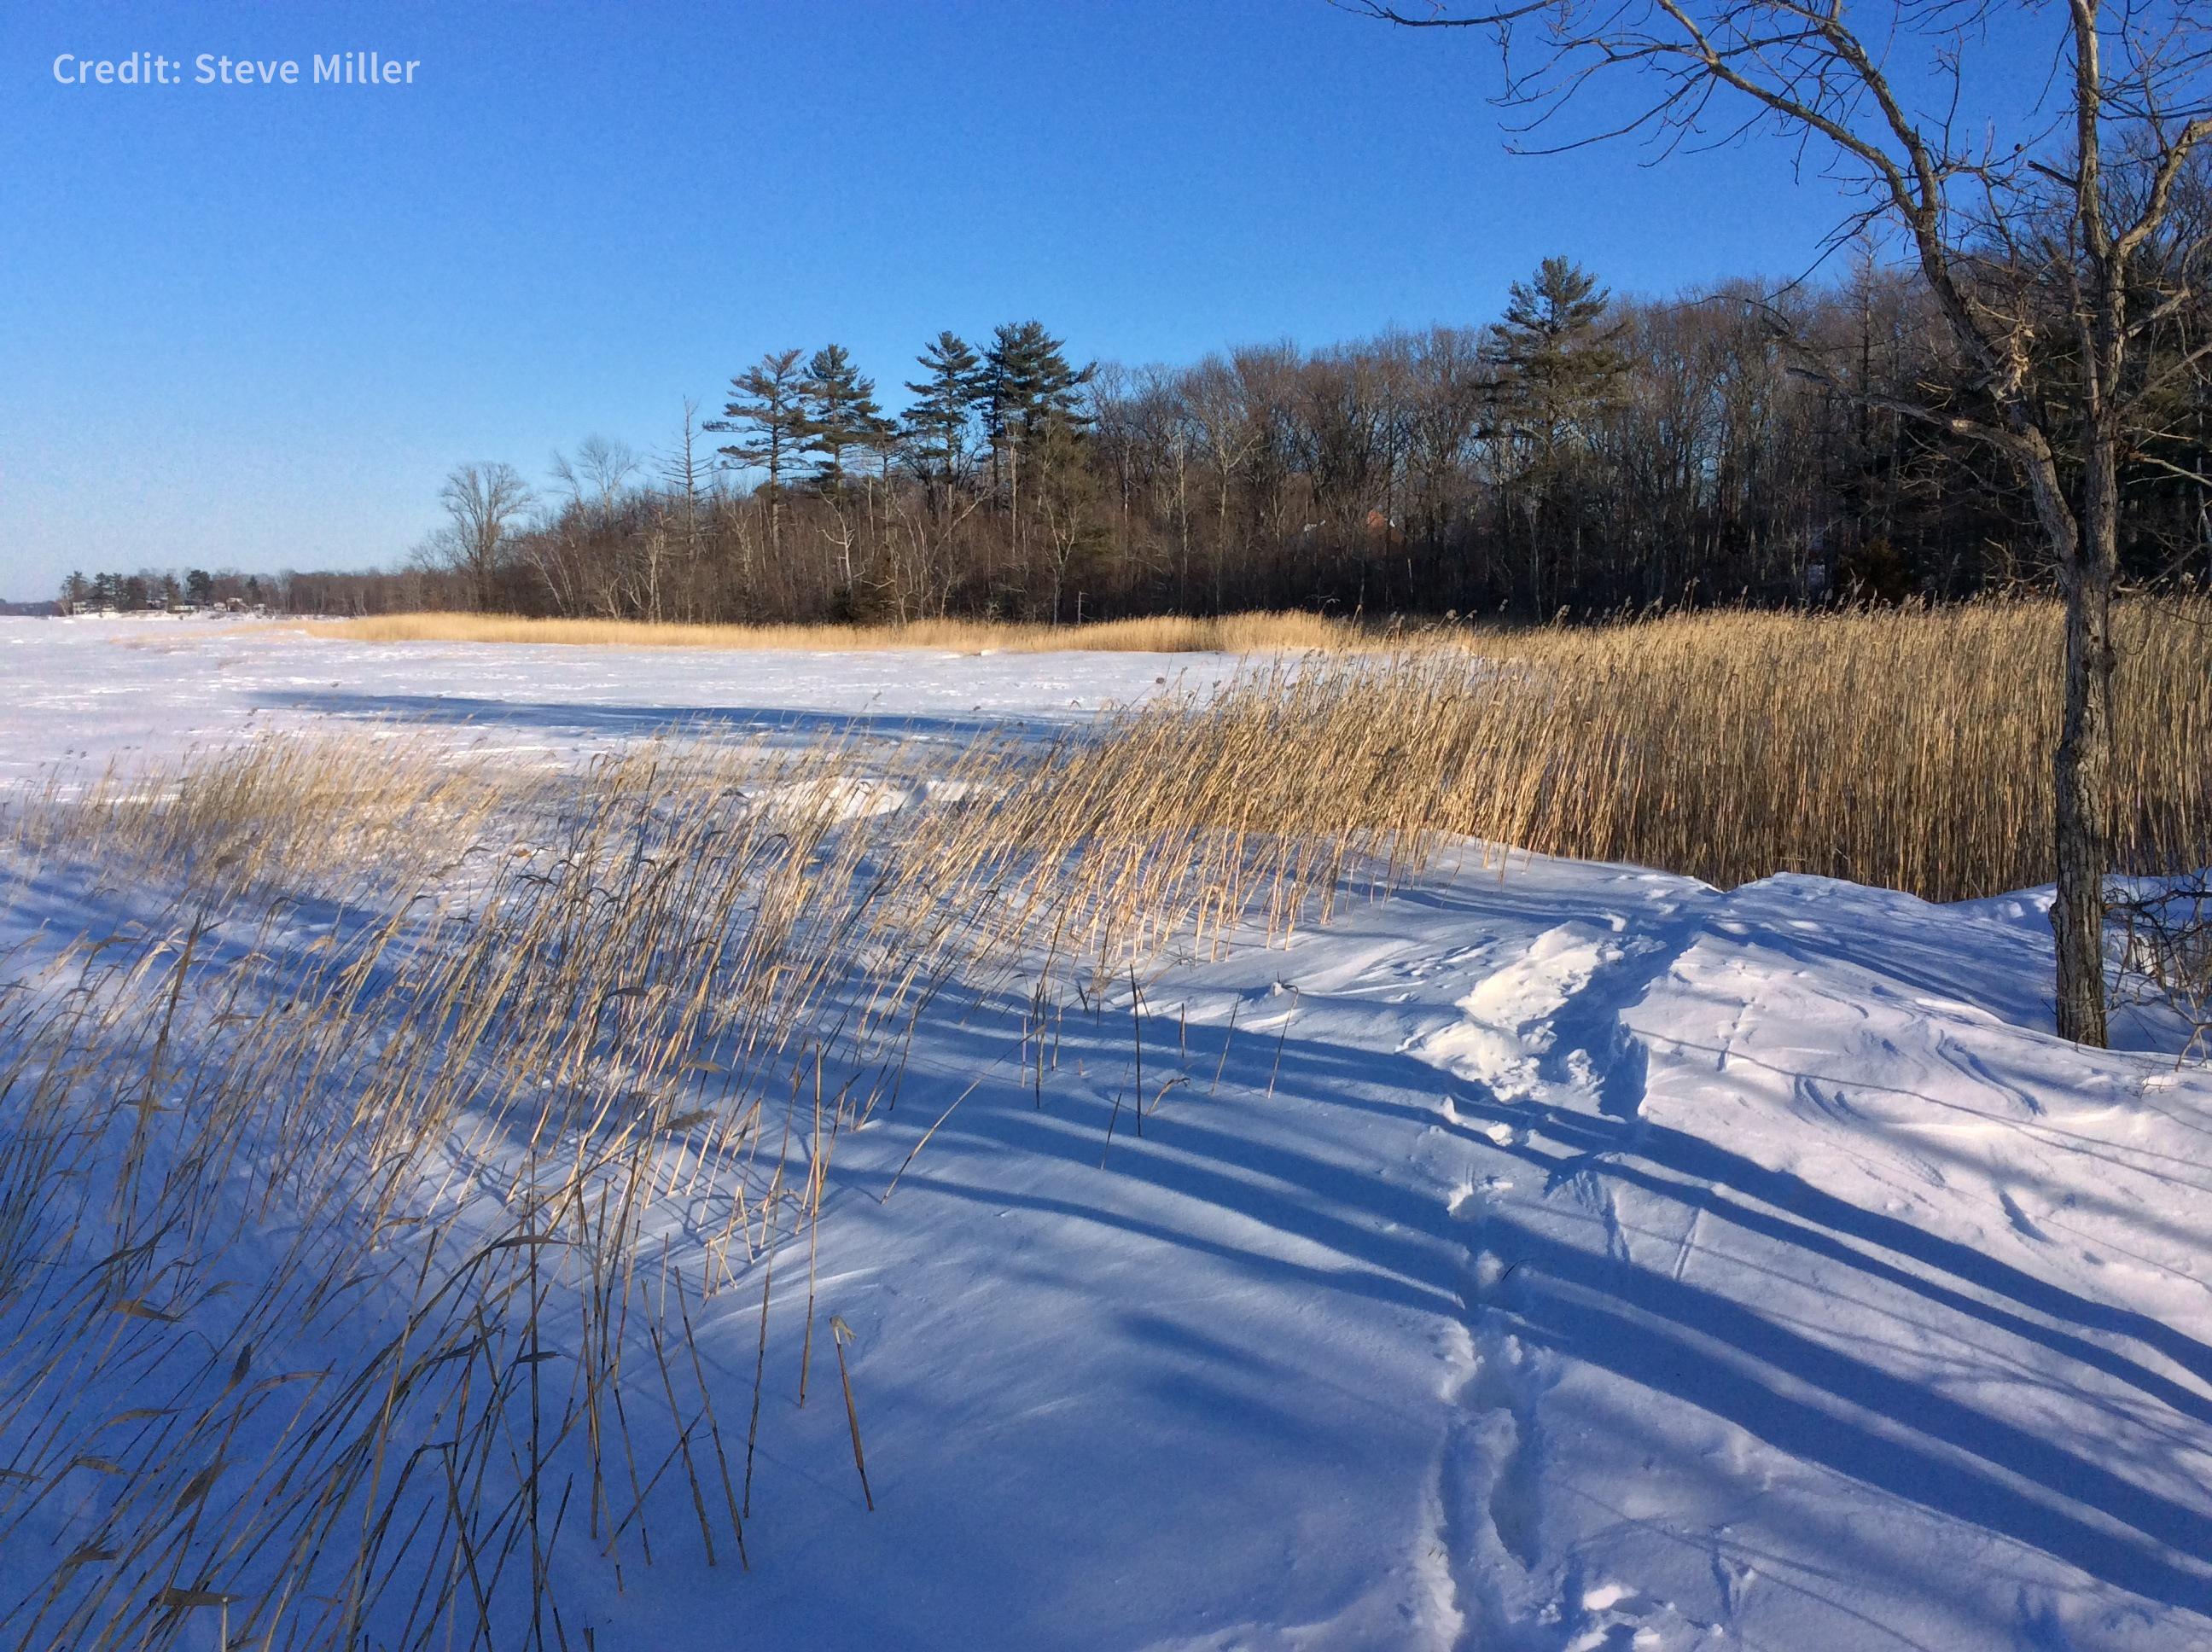 GreatBayNERR_snowy-boardwalk_SteveMiller_credit.jpg